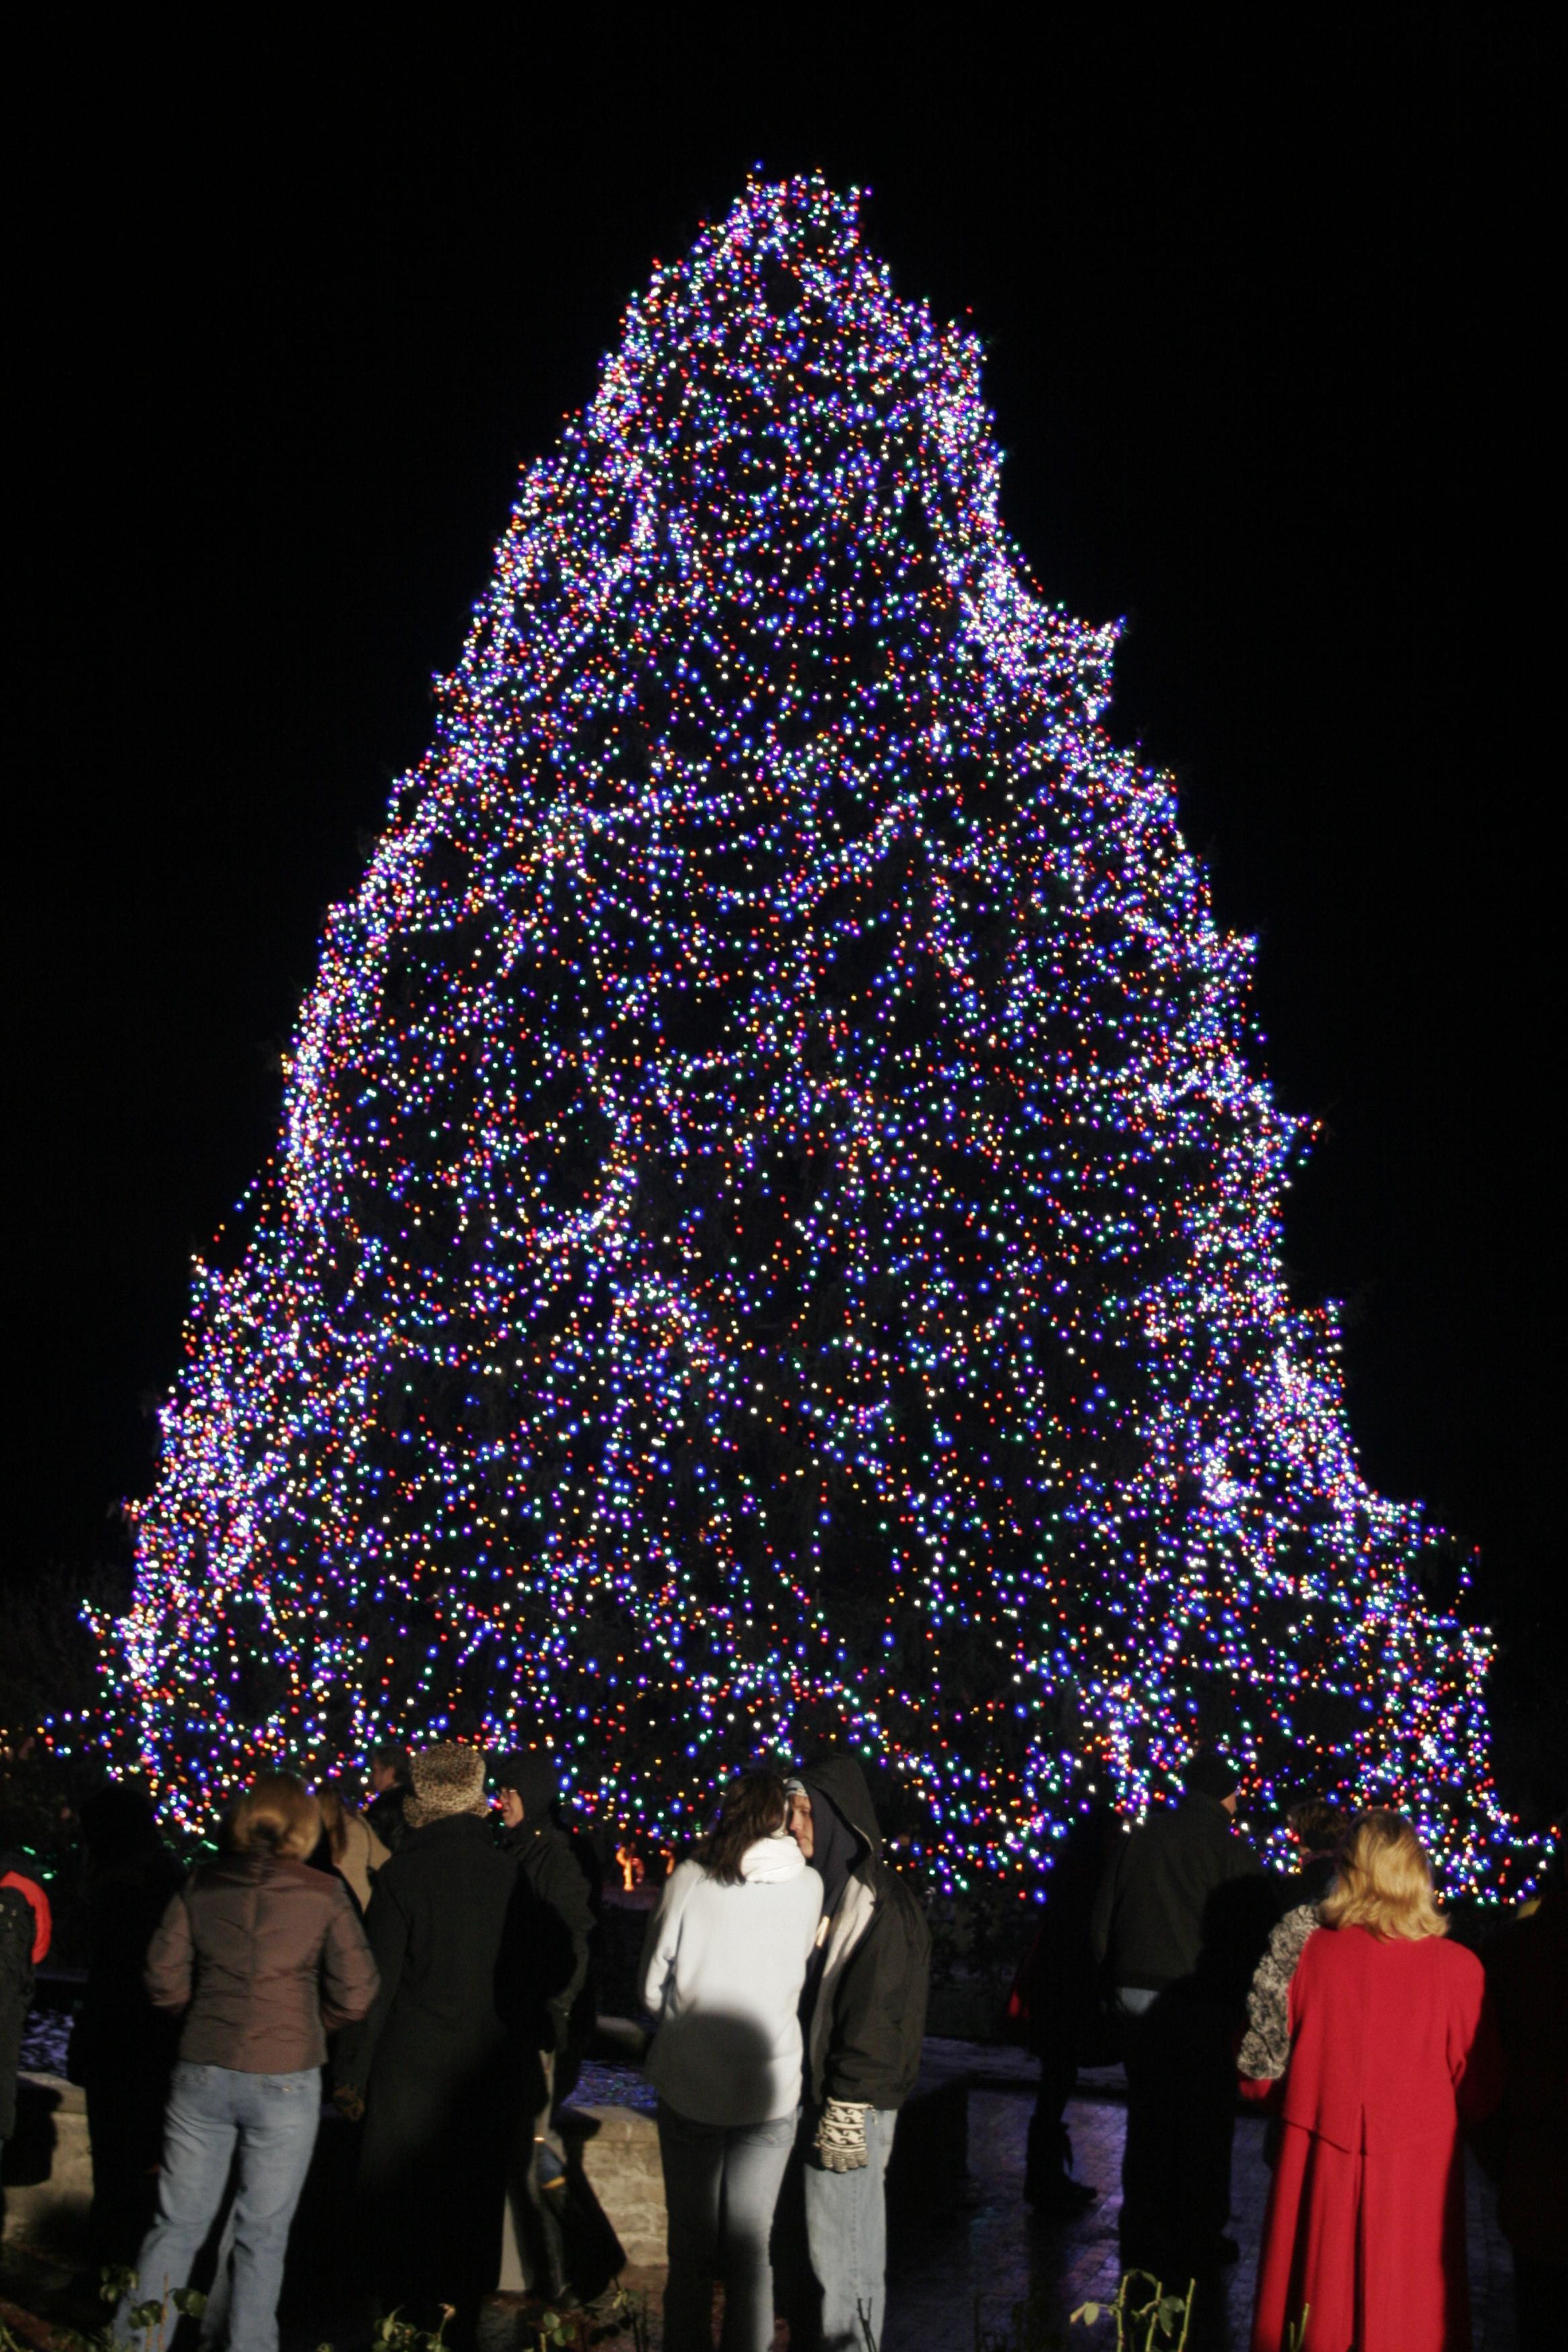 toledo zoos lights before christmas unveils pedal power the blade - Toledo Zoo Lights Before Christmas